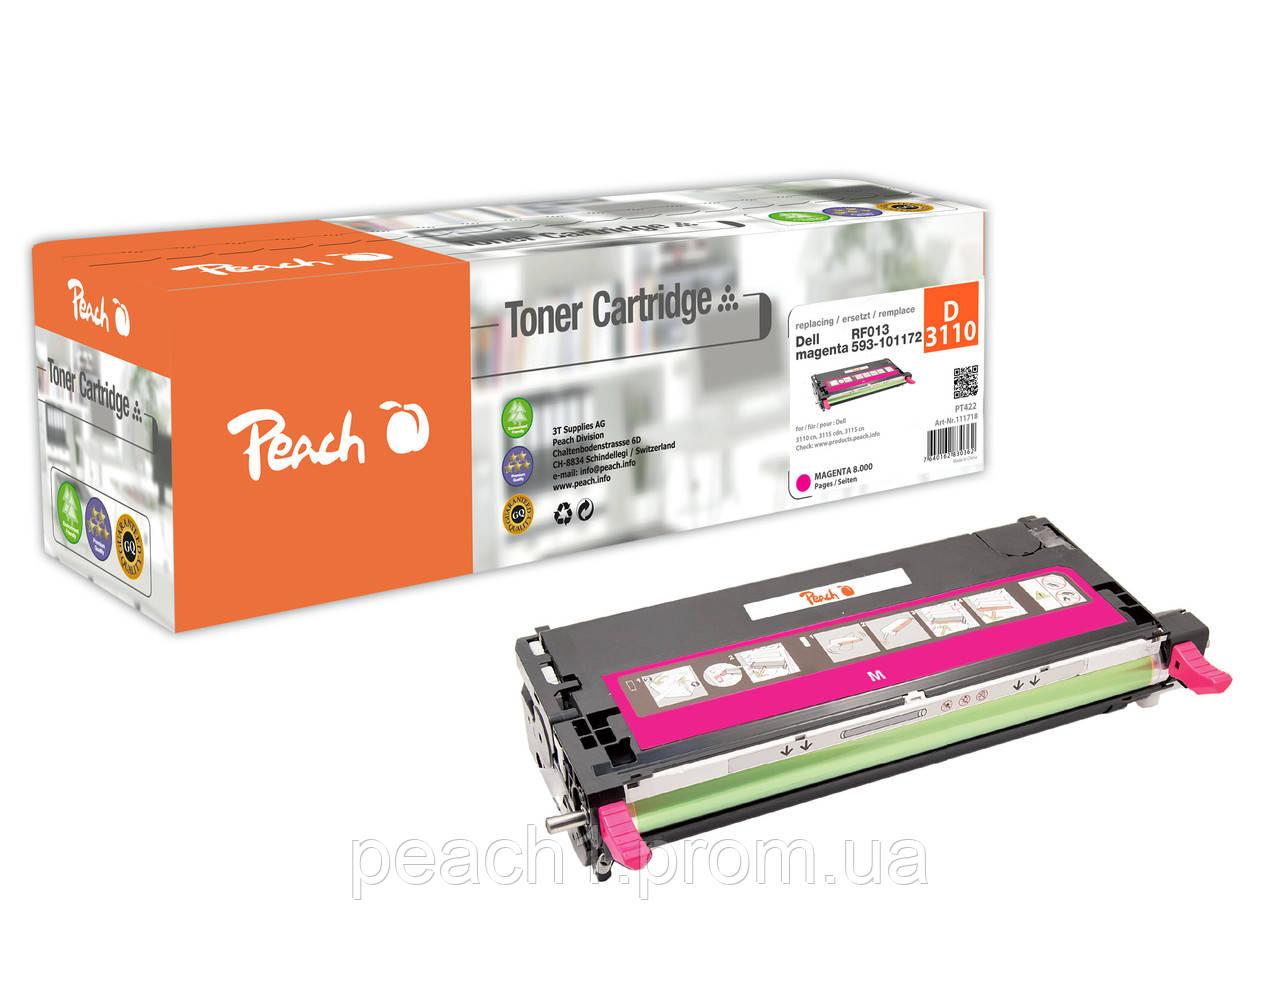 Лазерный картридж пурпурный (magenta) Dell RF013